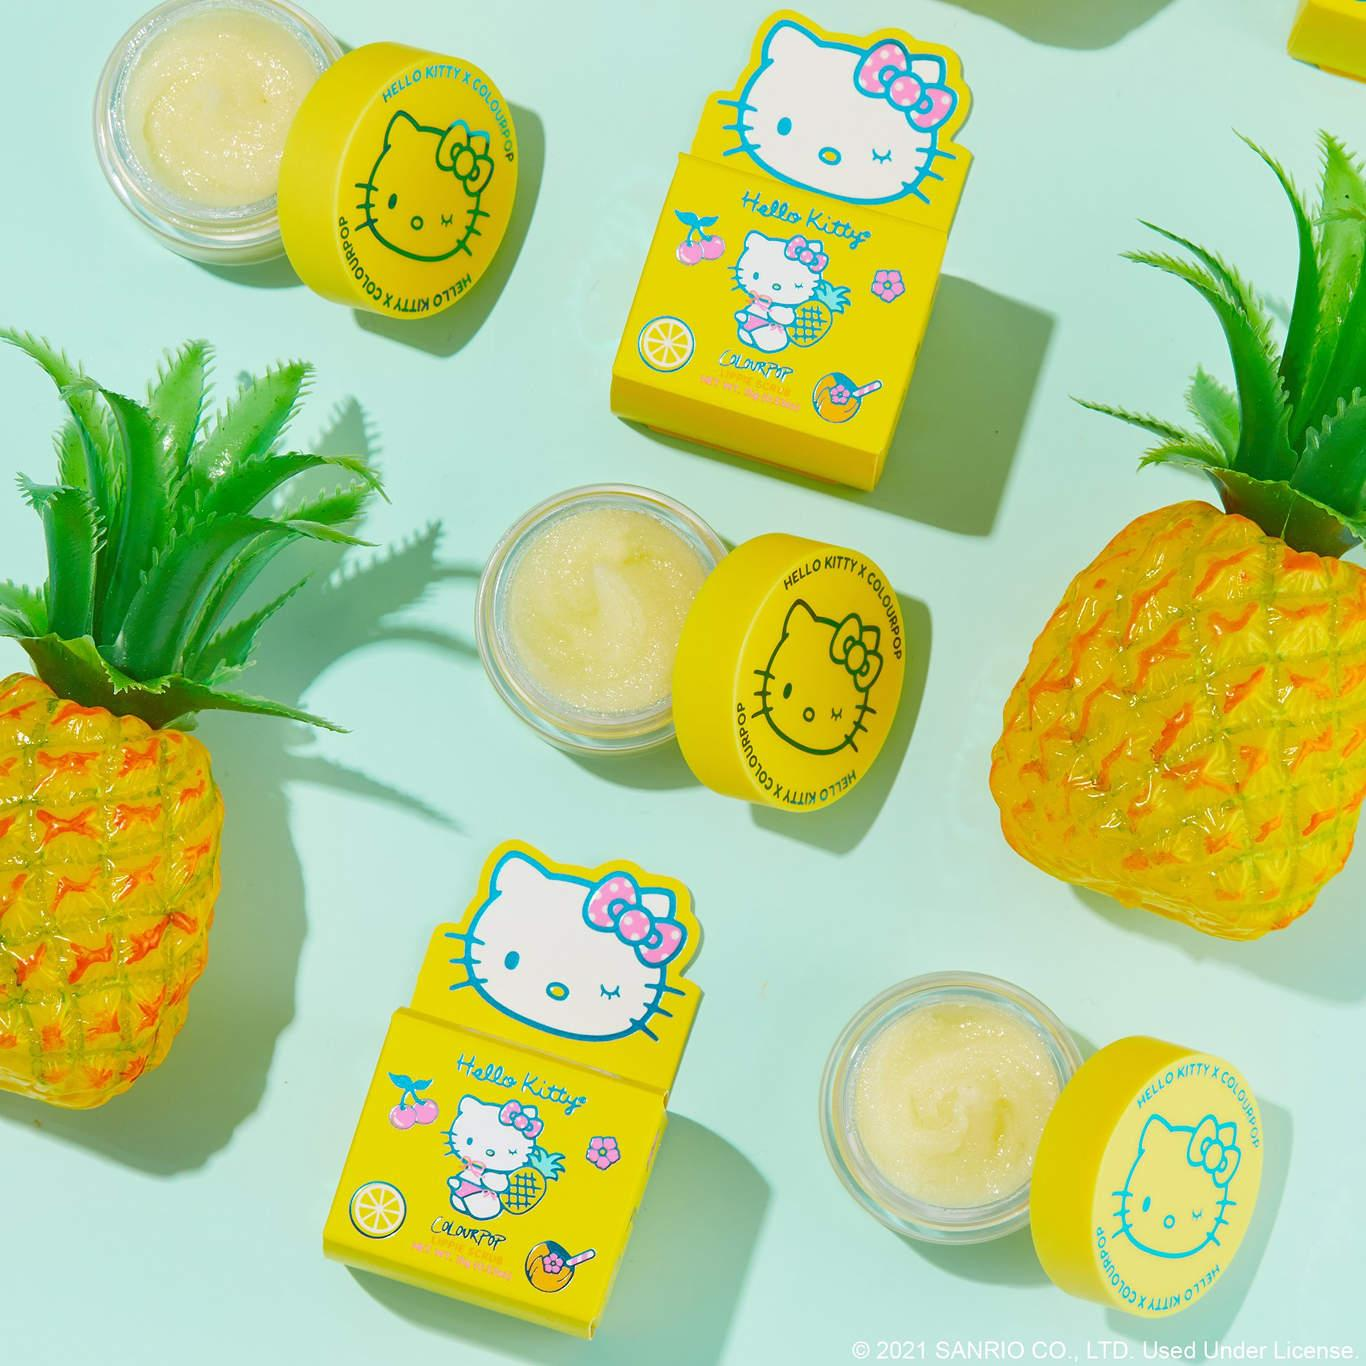 ColourPop x Hello Kitty Tropical Escape Collection Pineapple Pop Lippie Scrub Promo